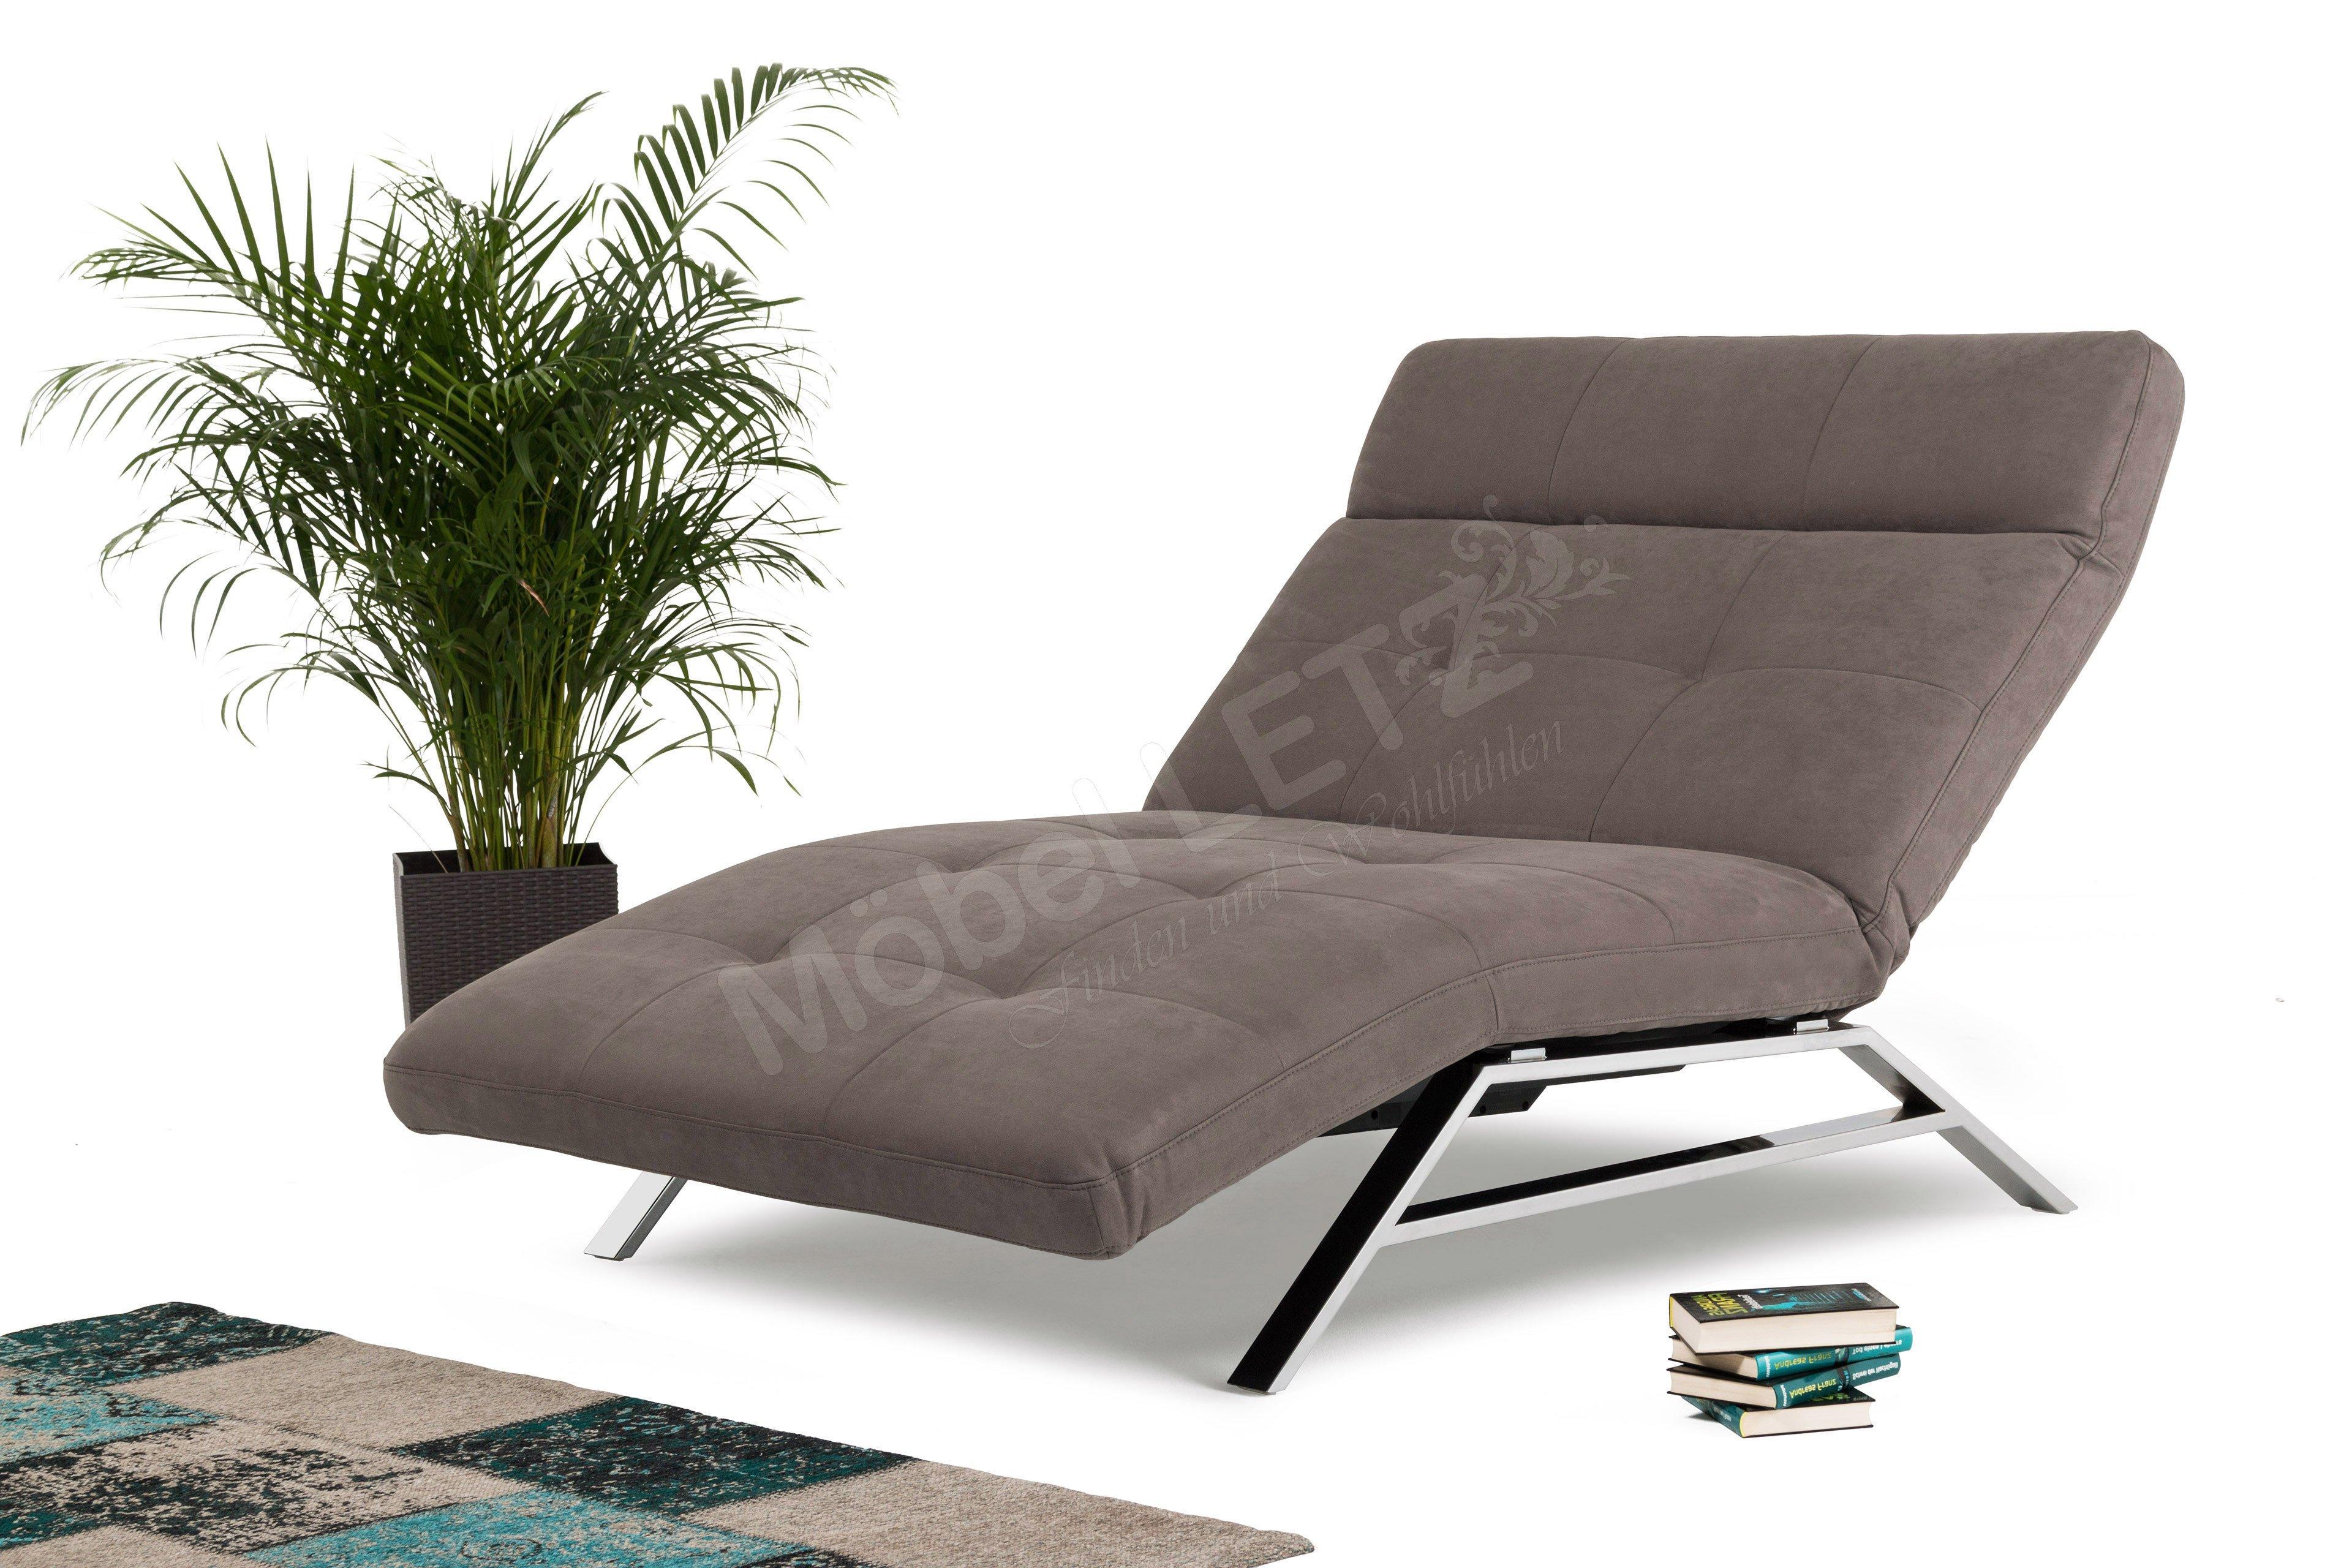 candy polsterm bel riviera liege grau braun m bel letz. Black Bedroom Furniture Sets. Home Design Ideas